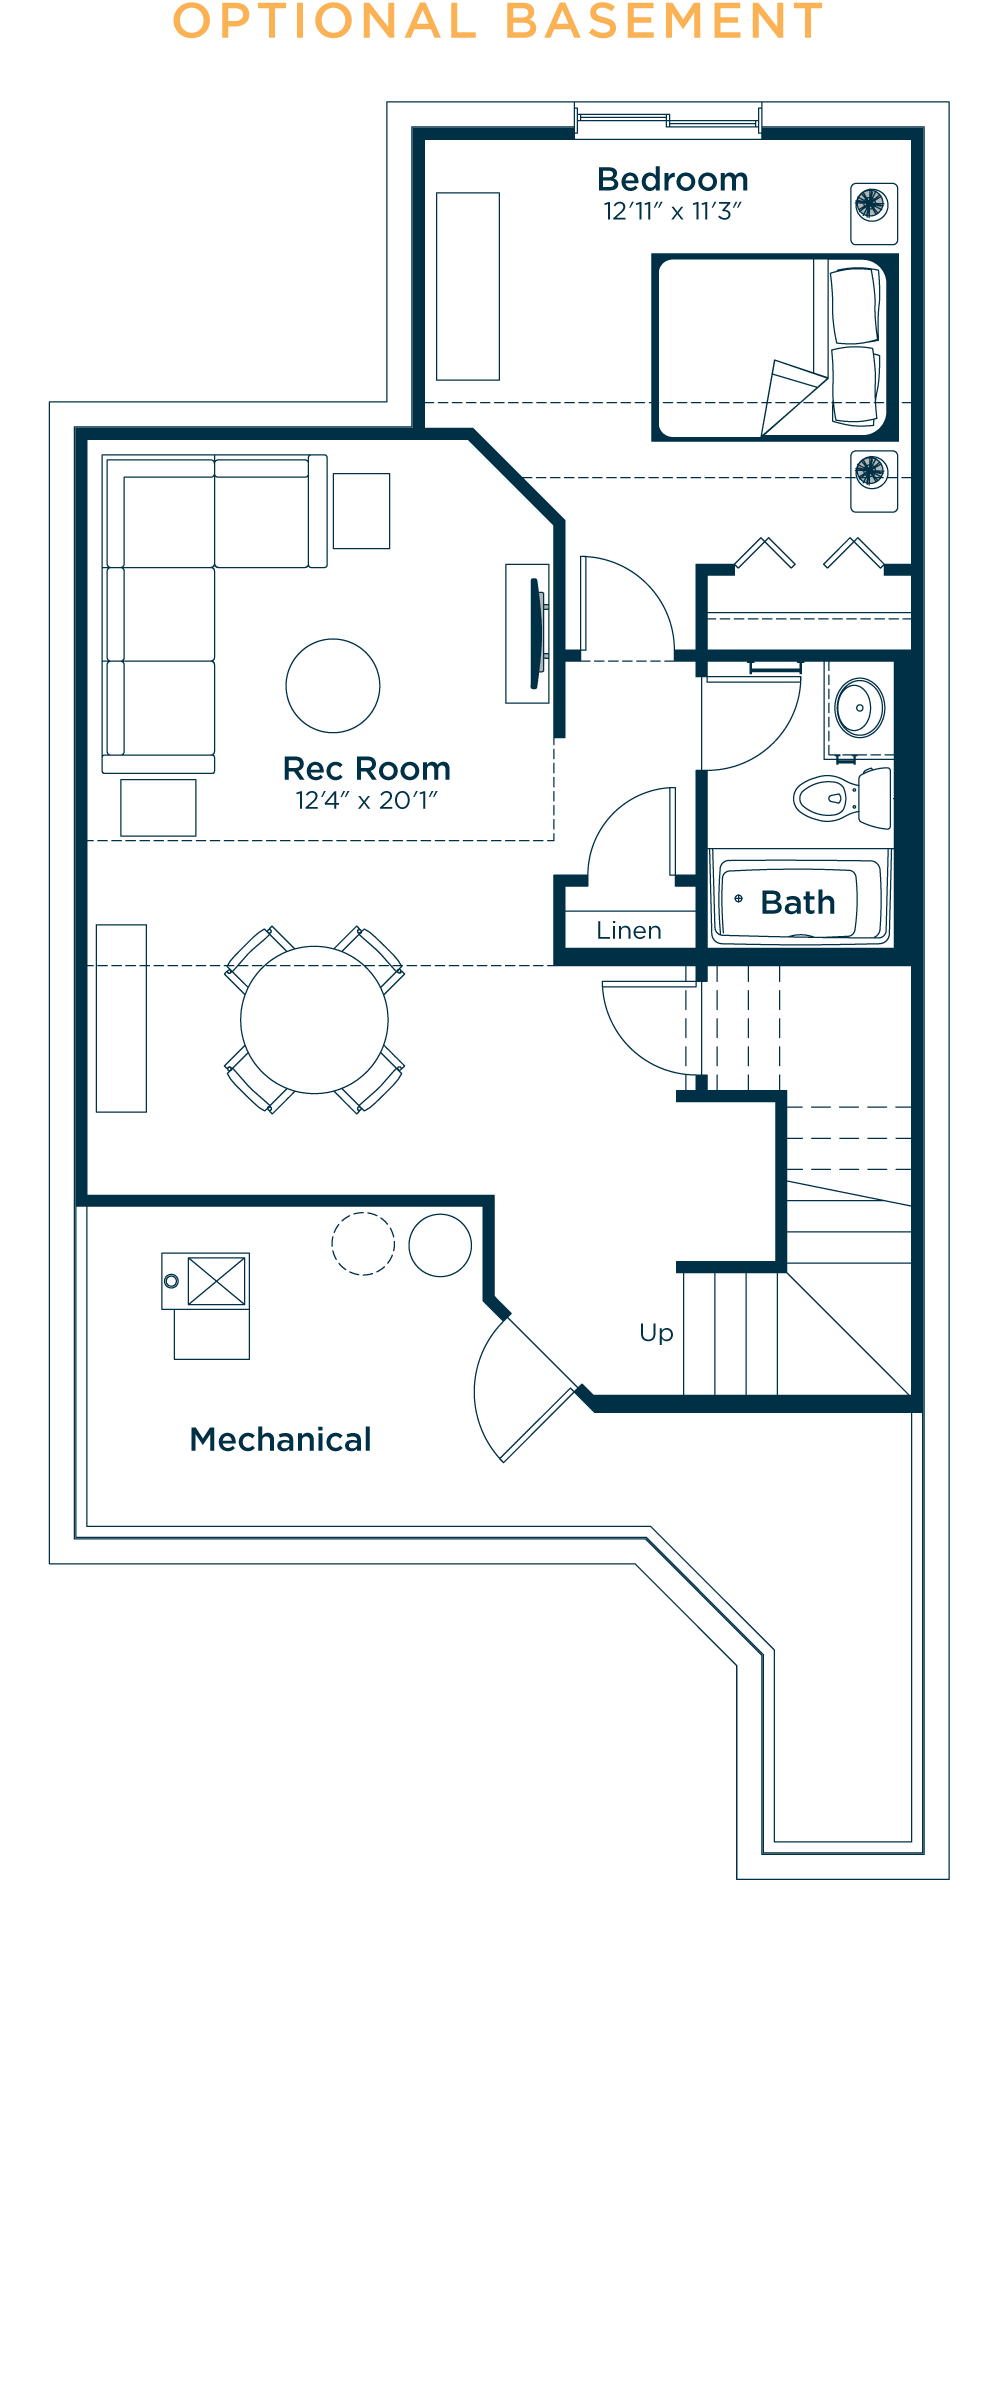 Optional Basement